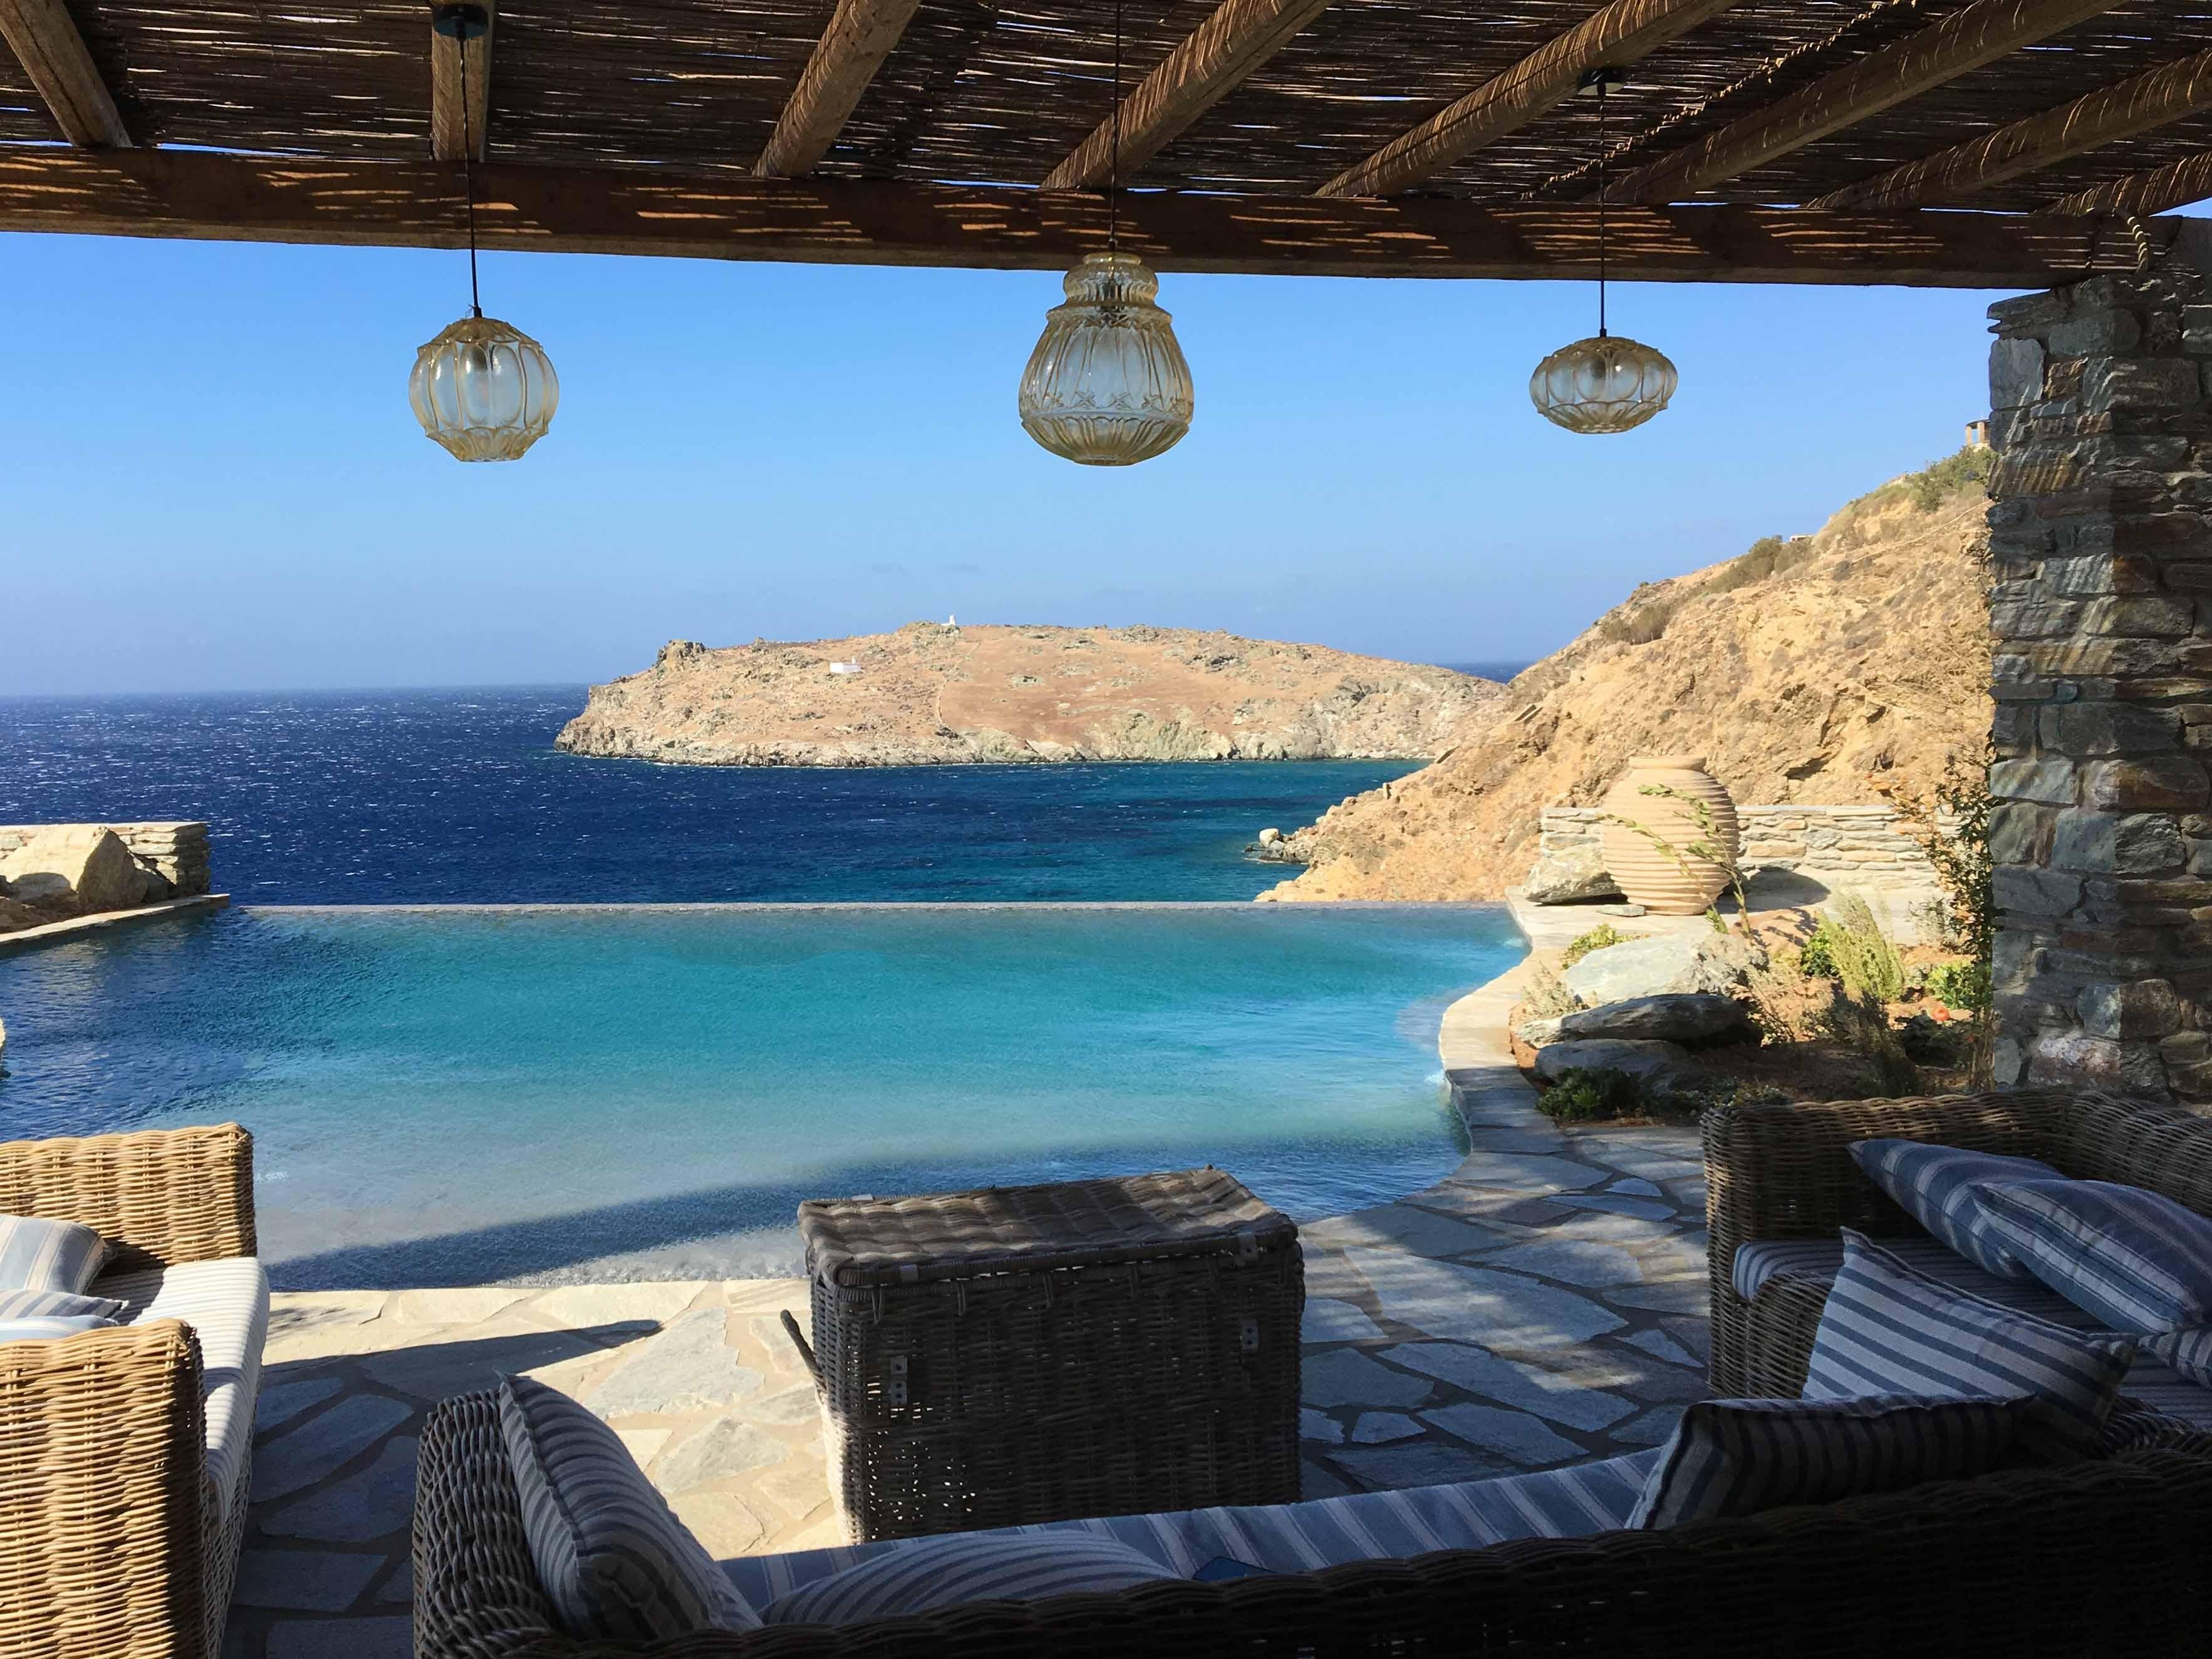 Splendid panorama among the Hellenic cliffs - استخر های شنا